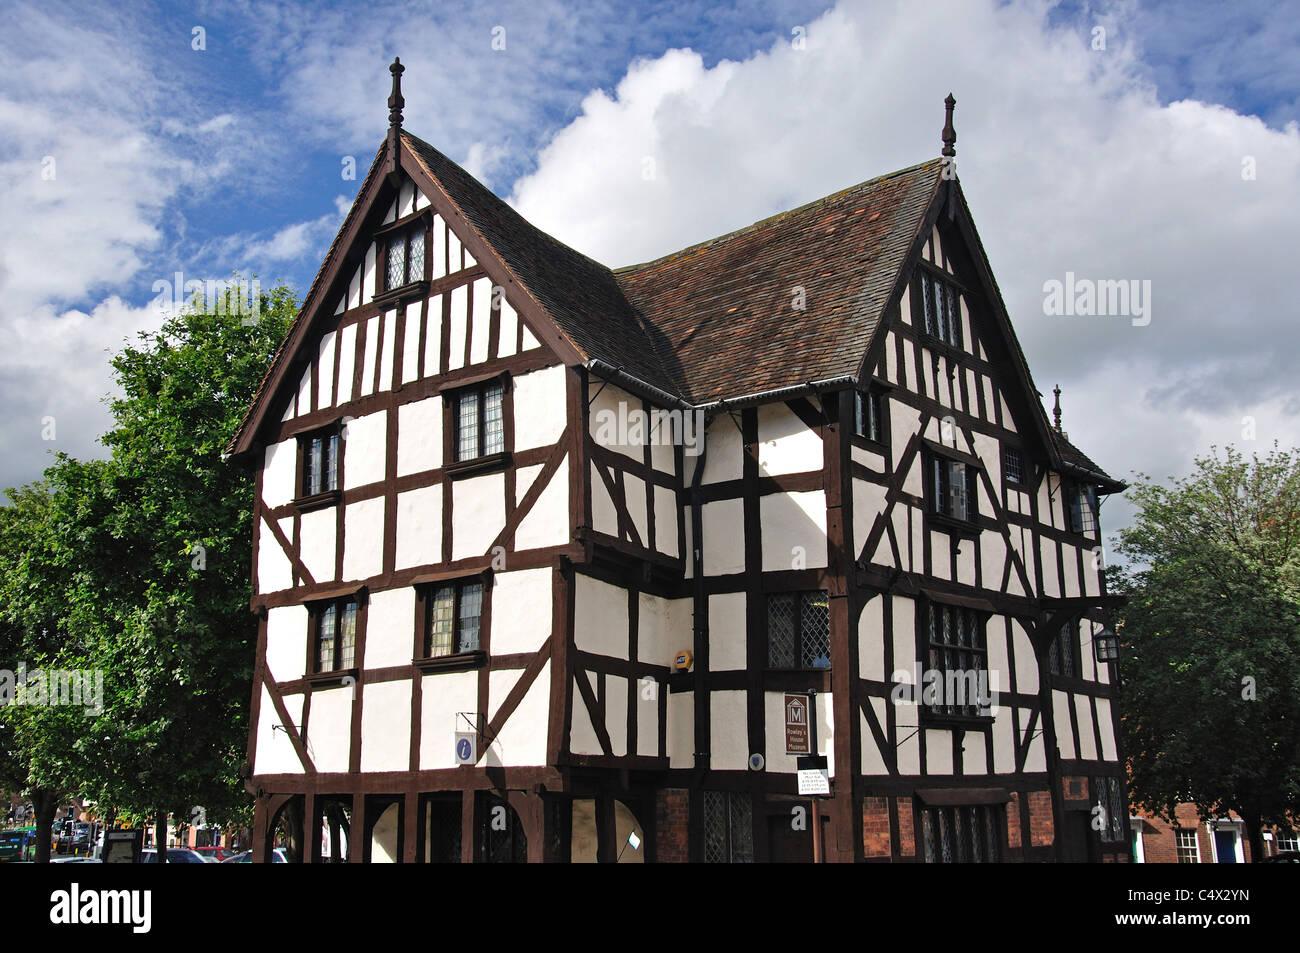 Balkendecke Modern Fotos : Middle ages art england stock photos &